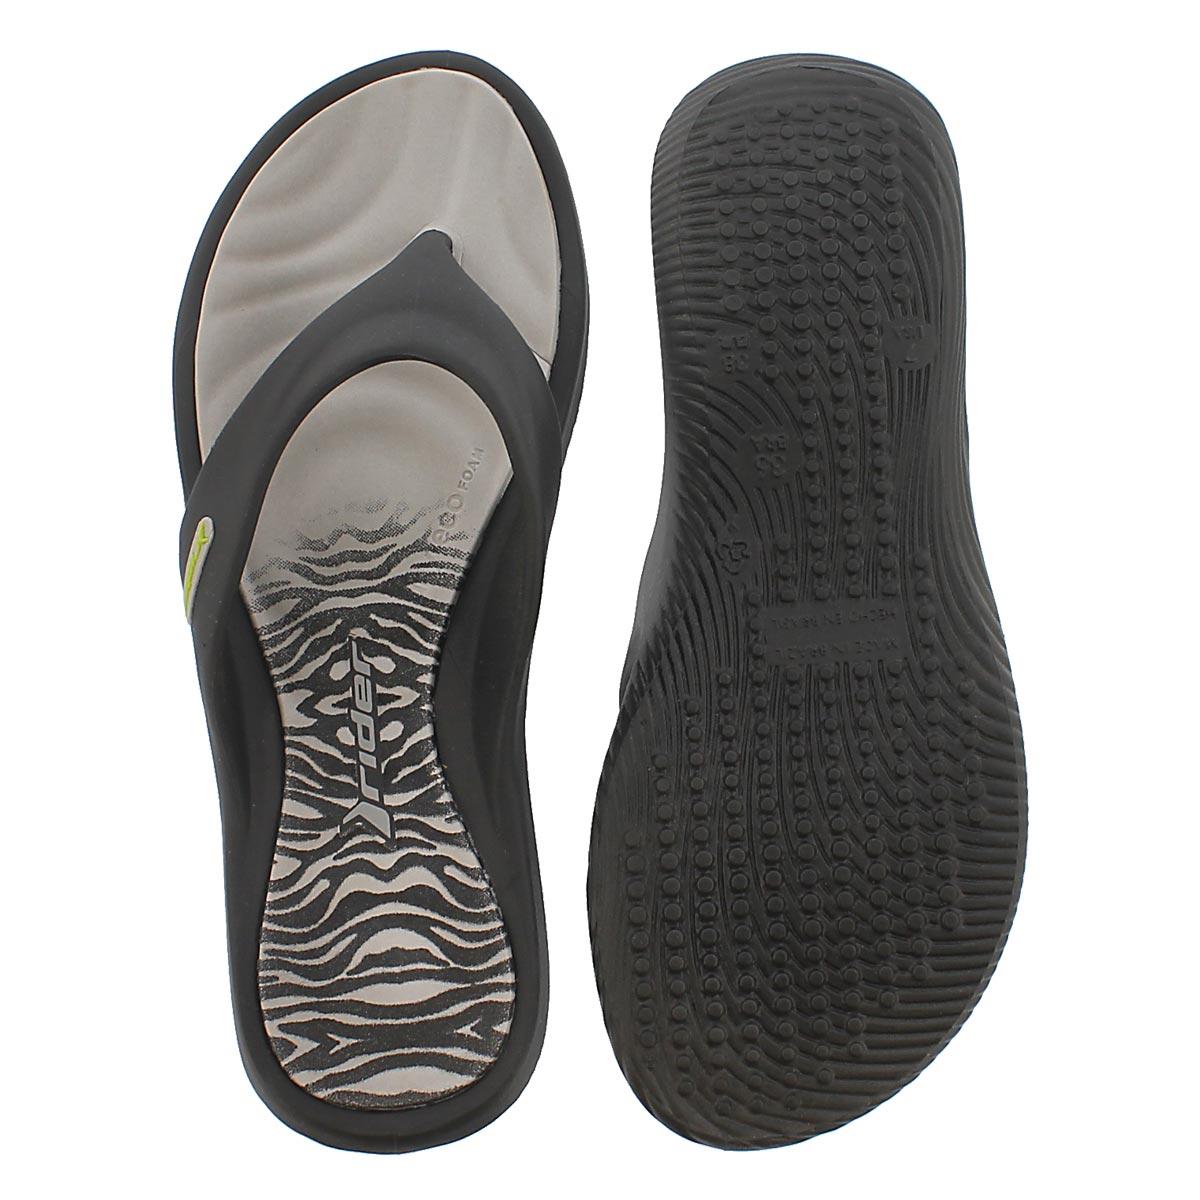 Lds Island VII grey thong sport sandal